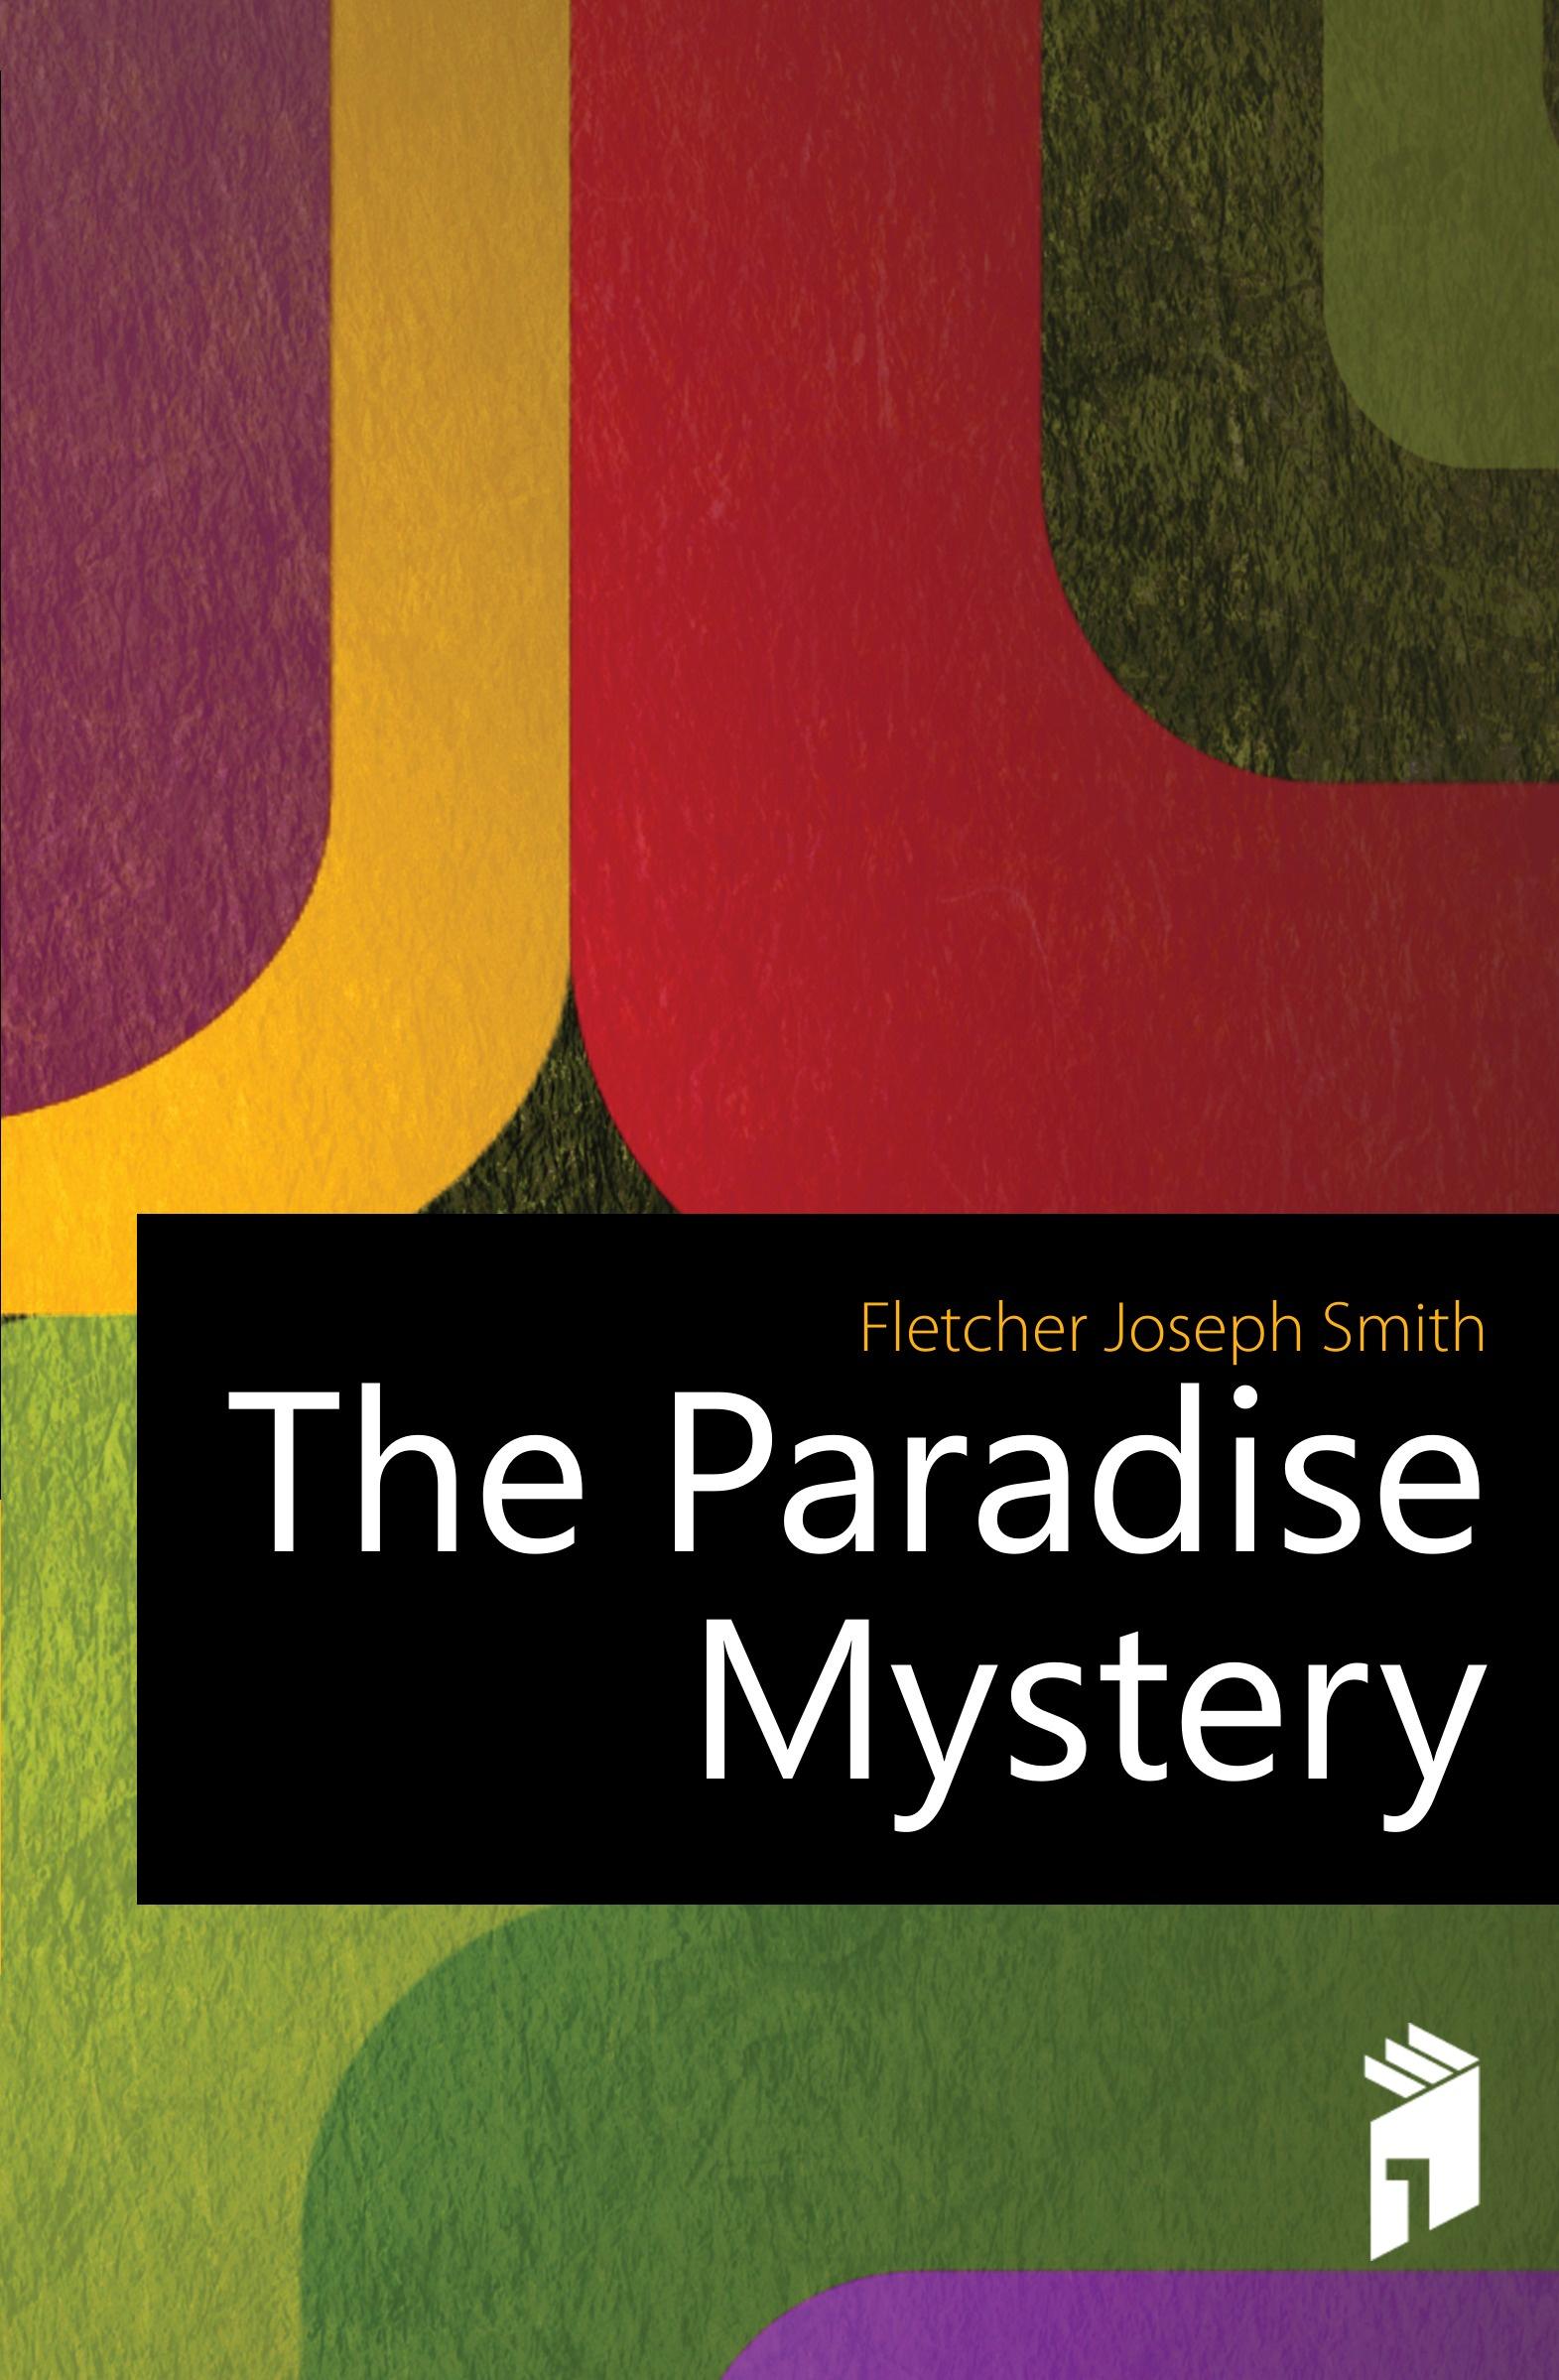 Fletcher Joseph Smith The Paradise Mystery